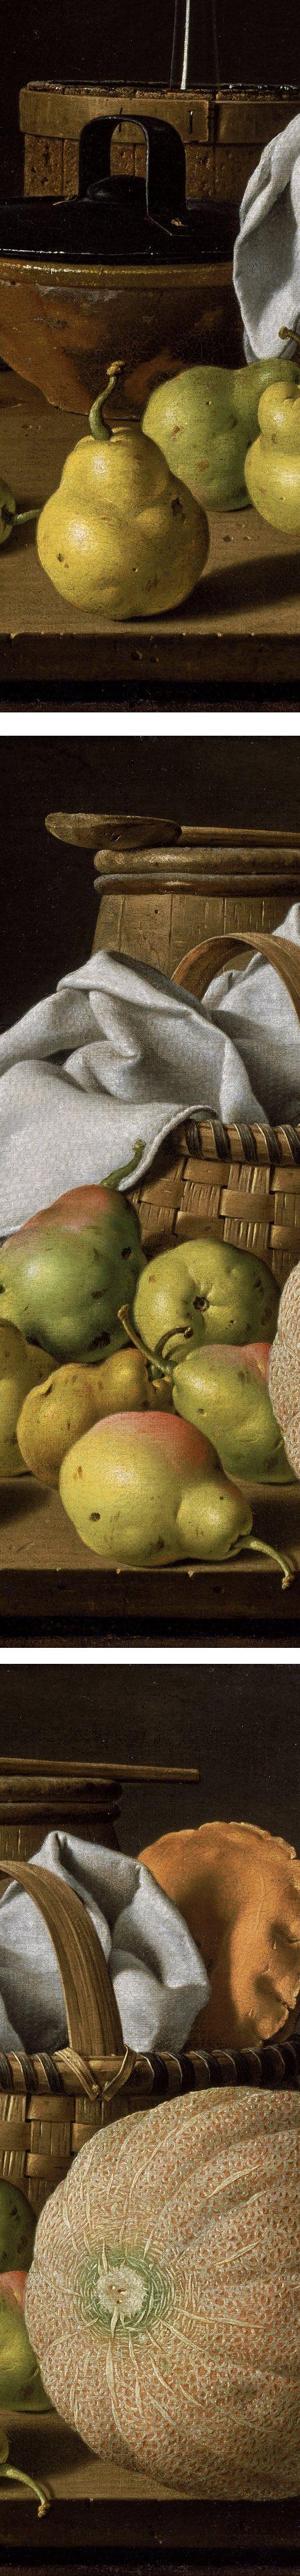 Still life with Melon and Pears, Luis Egidio Melendez